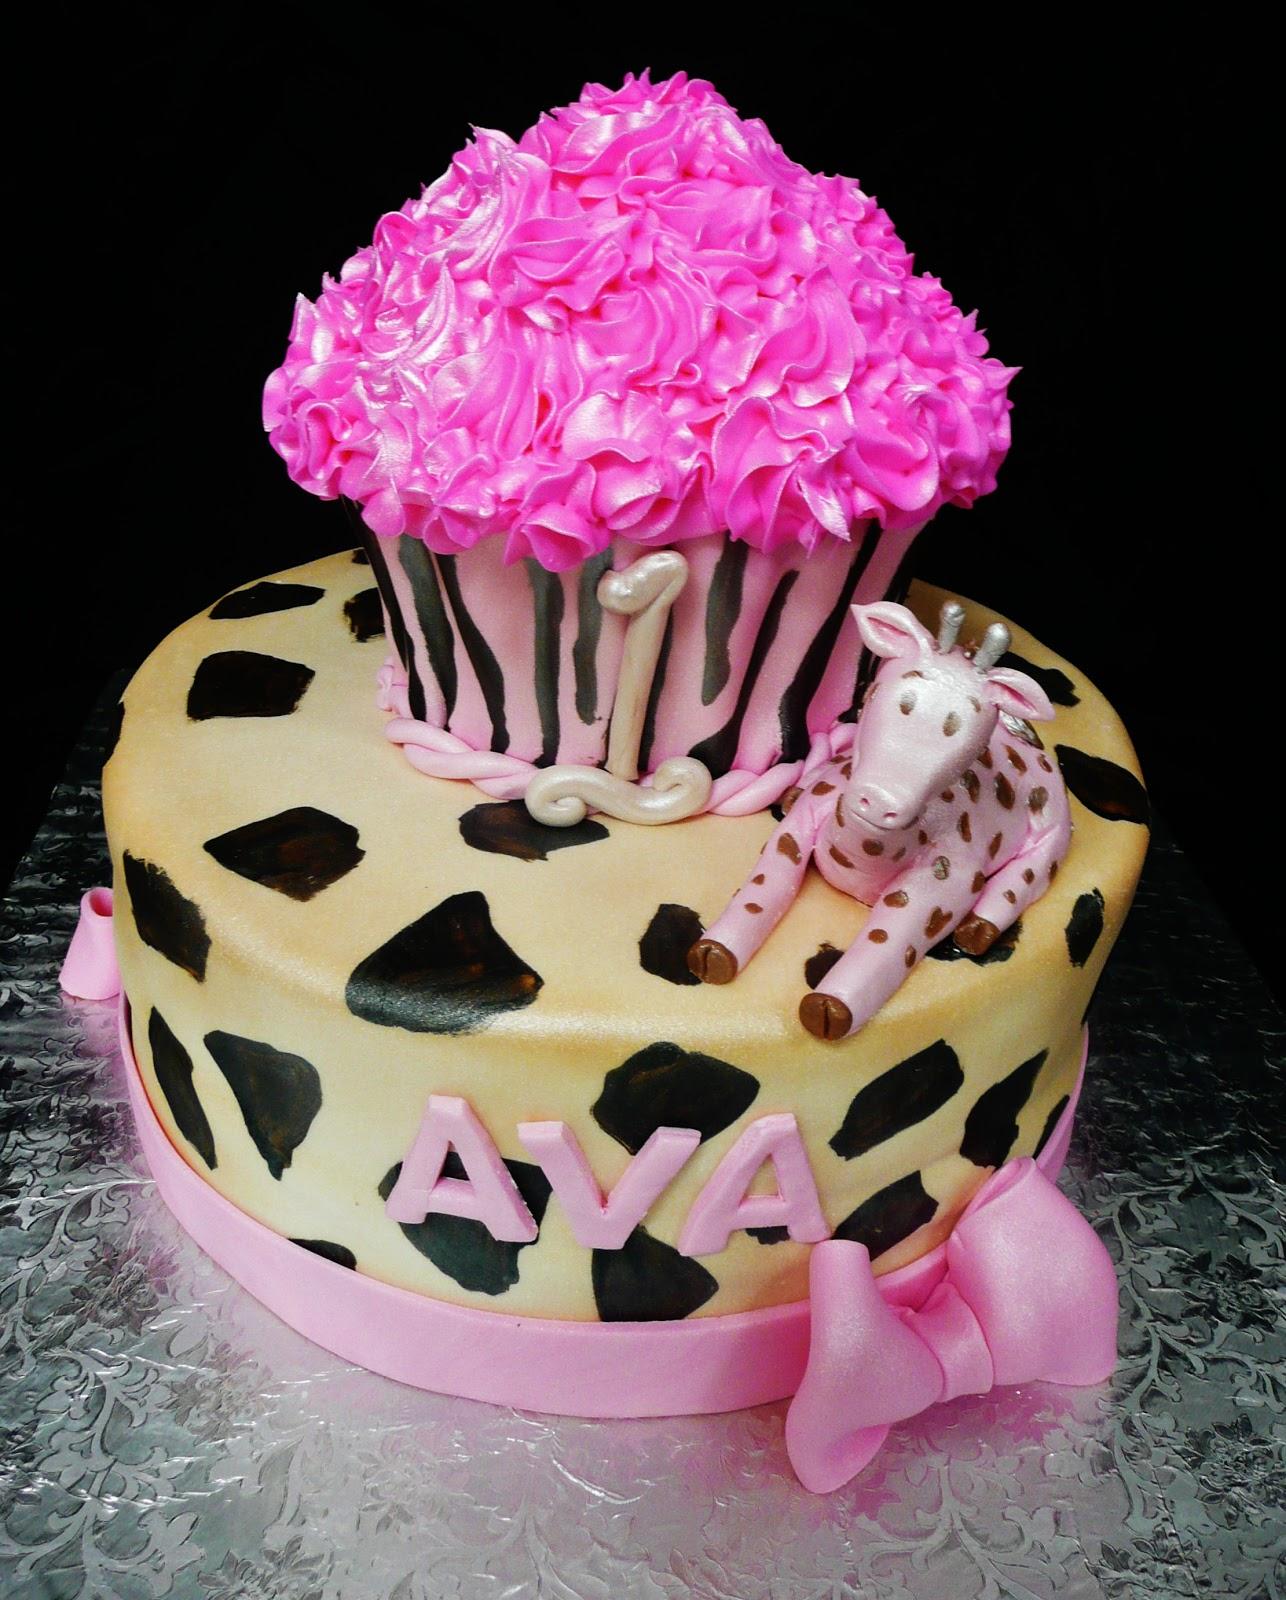 Baking With Roxana's Cakes: Animal Print Birthday Cake